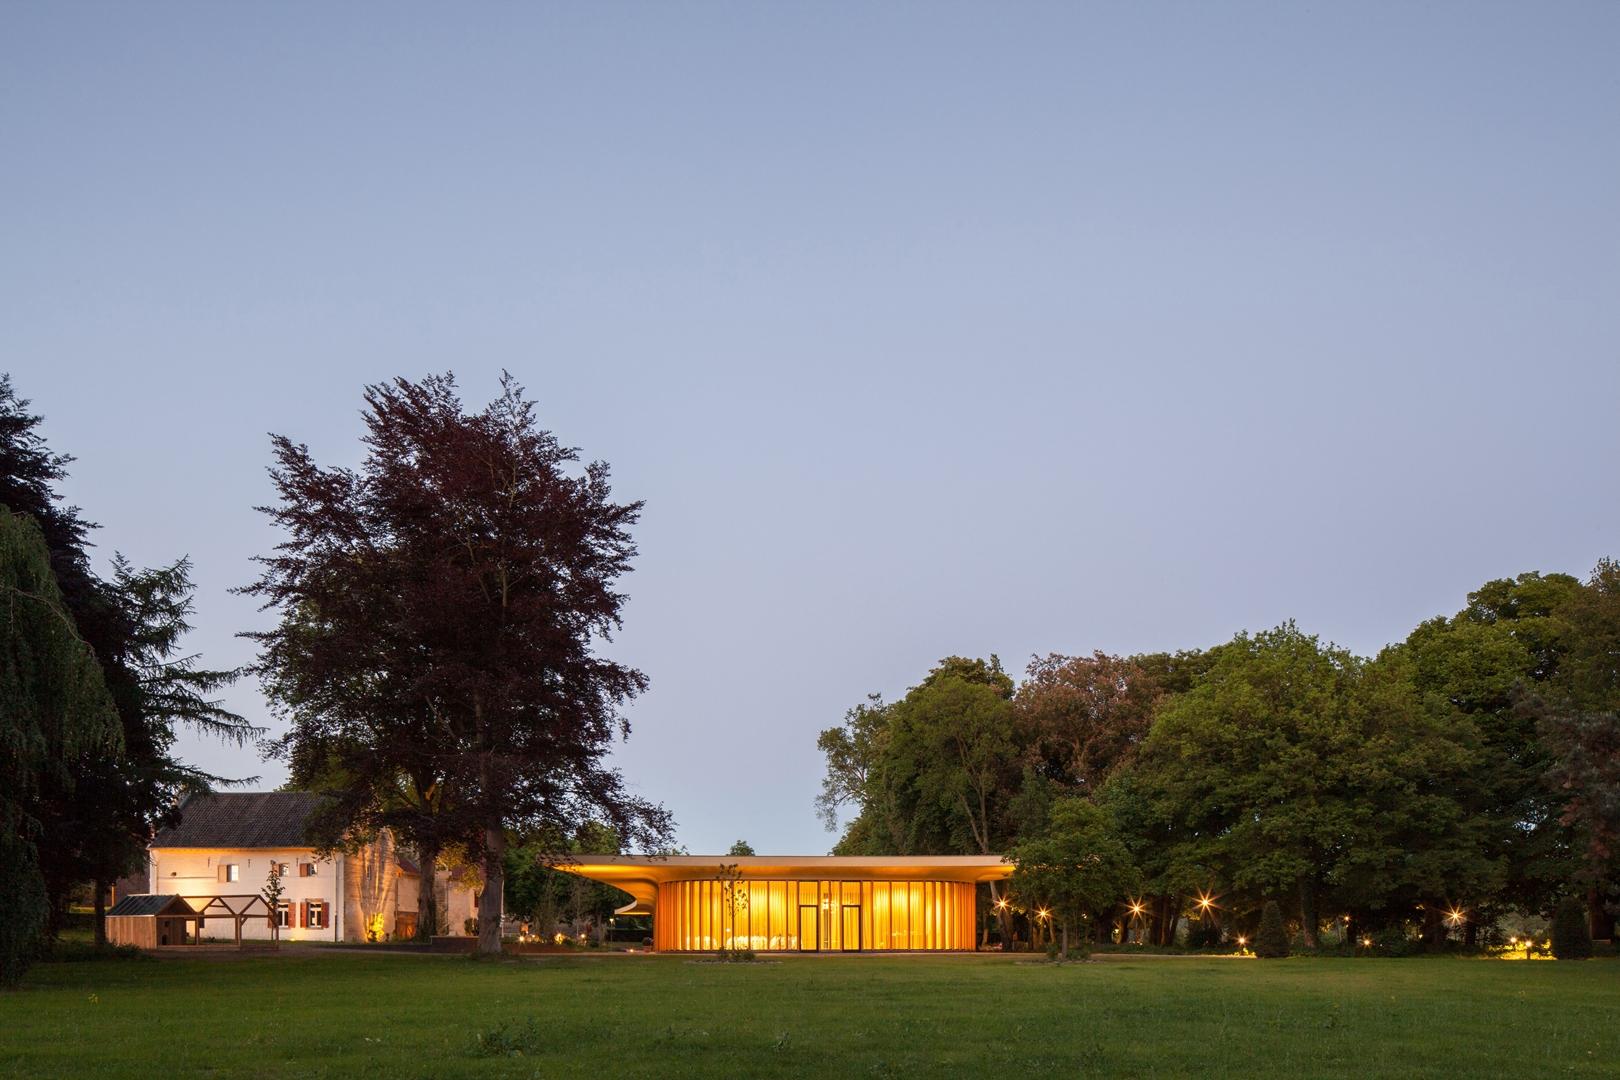 11_St Gerlach pavilion and manor farm_Photo by Mecanoo architecten (Copy)